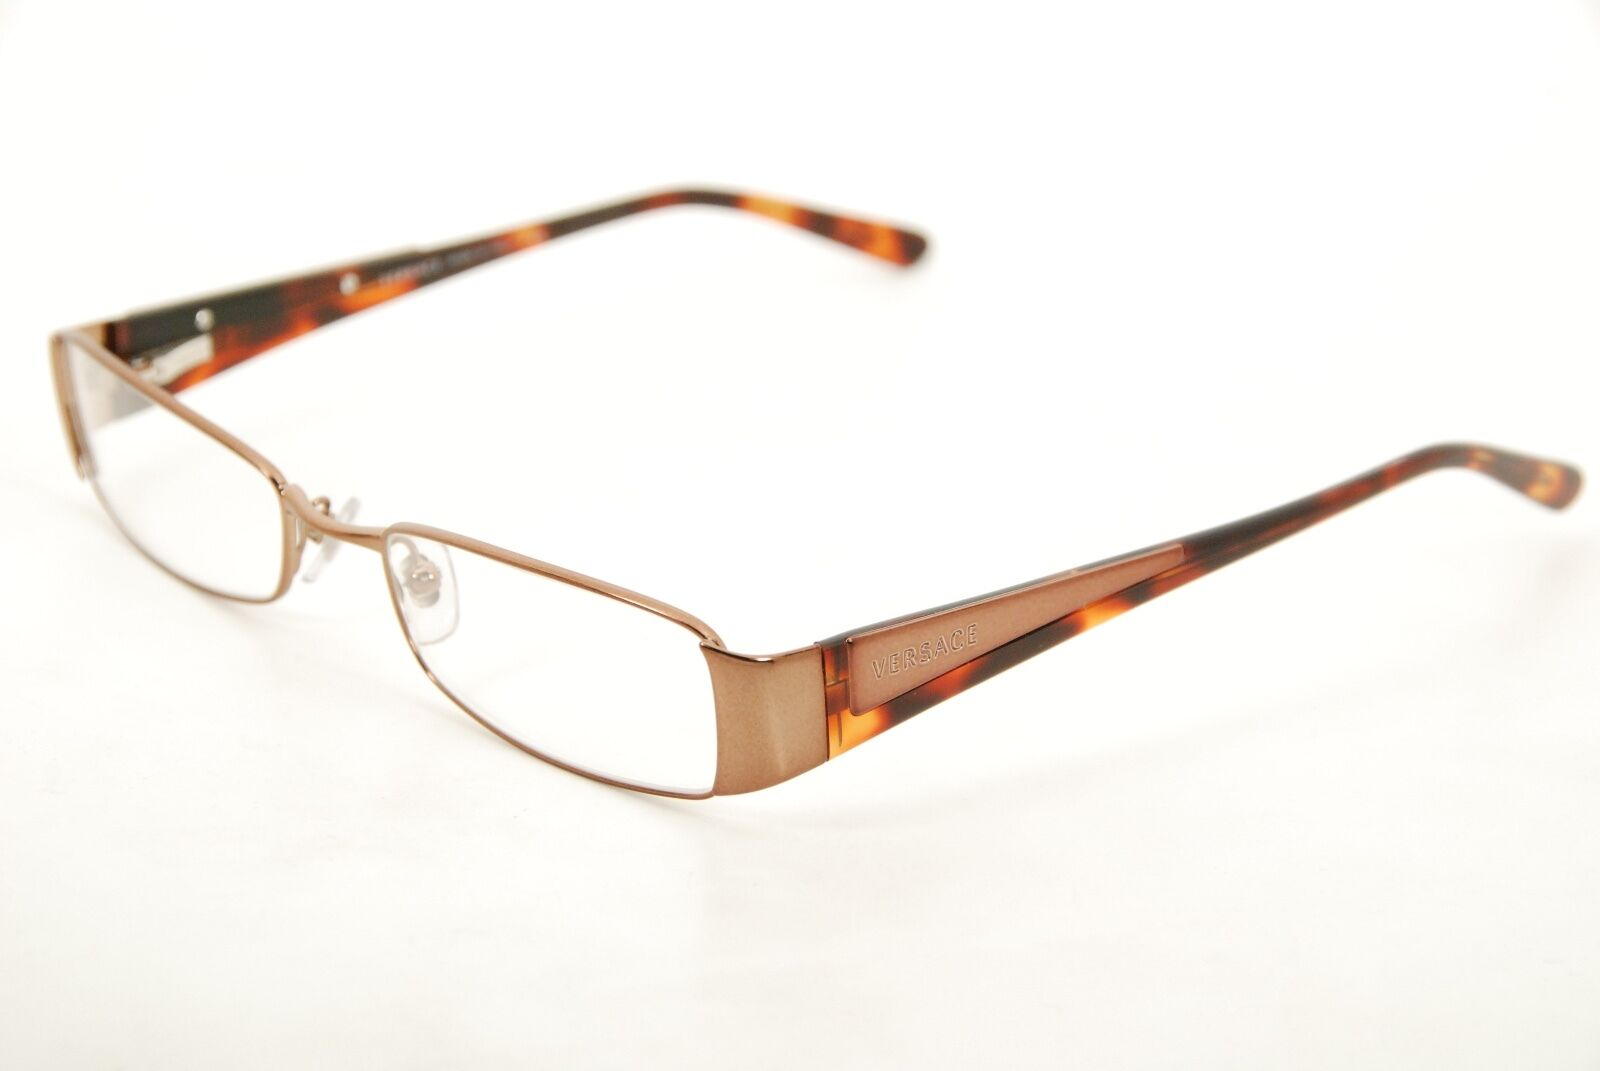 5e521aae1856 Authentic Versace Mod 1084 1045 Bronze havana 50mm Eyeglasses RX ...